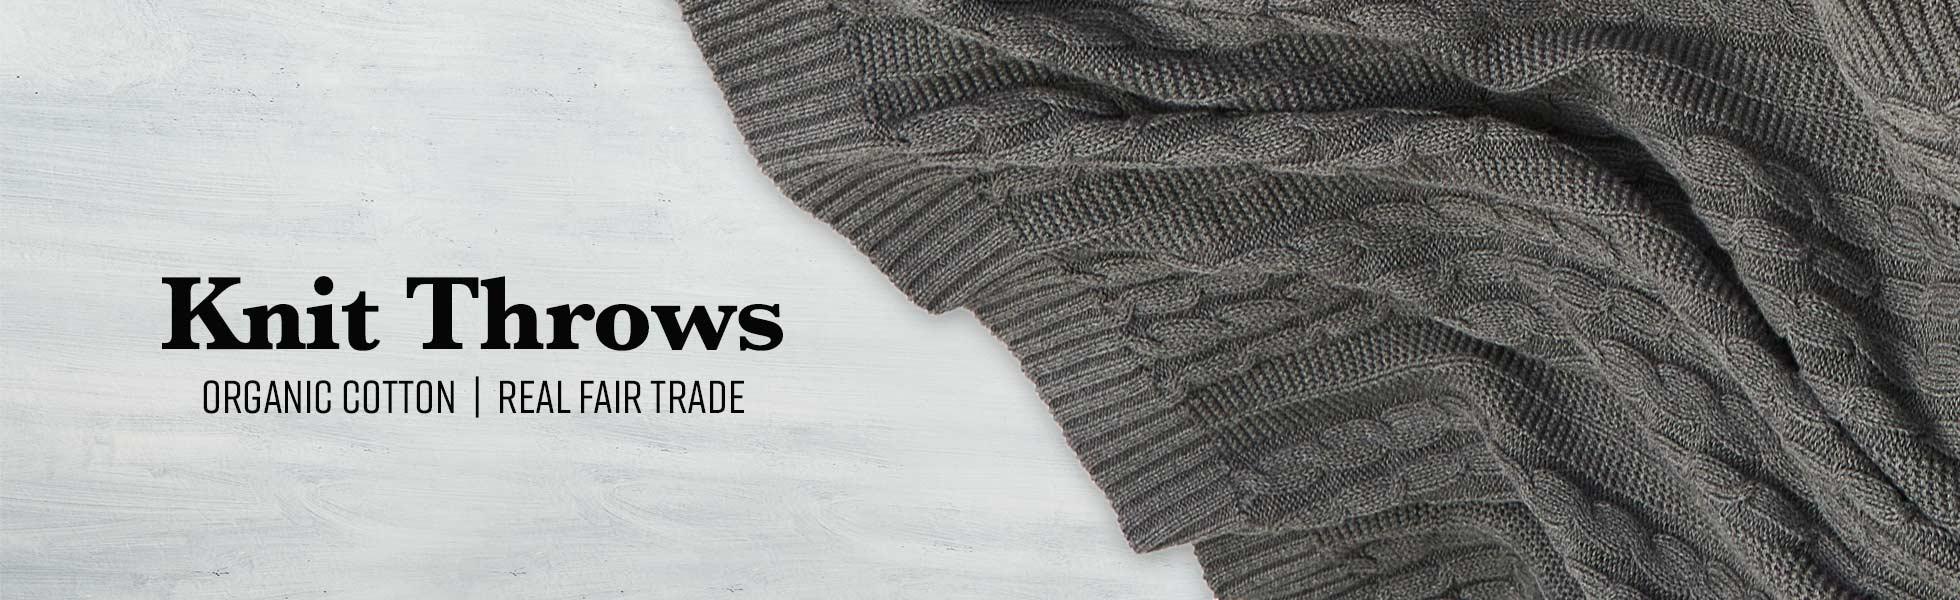 Organic Cotton Knit Throws